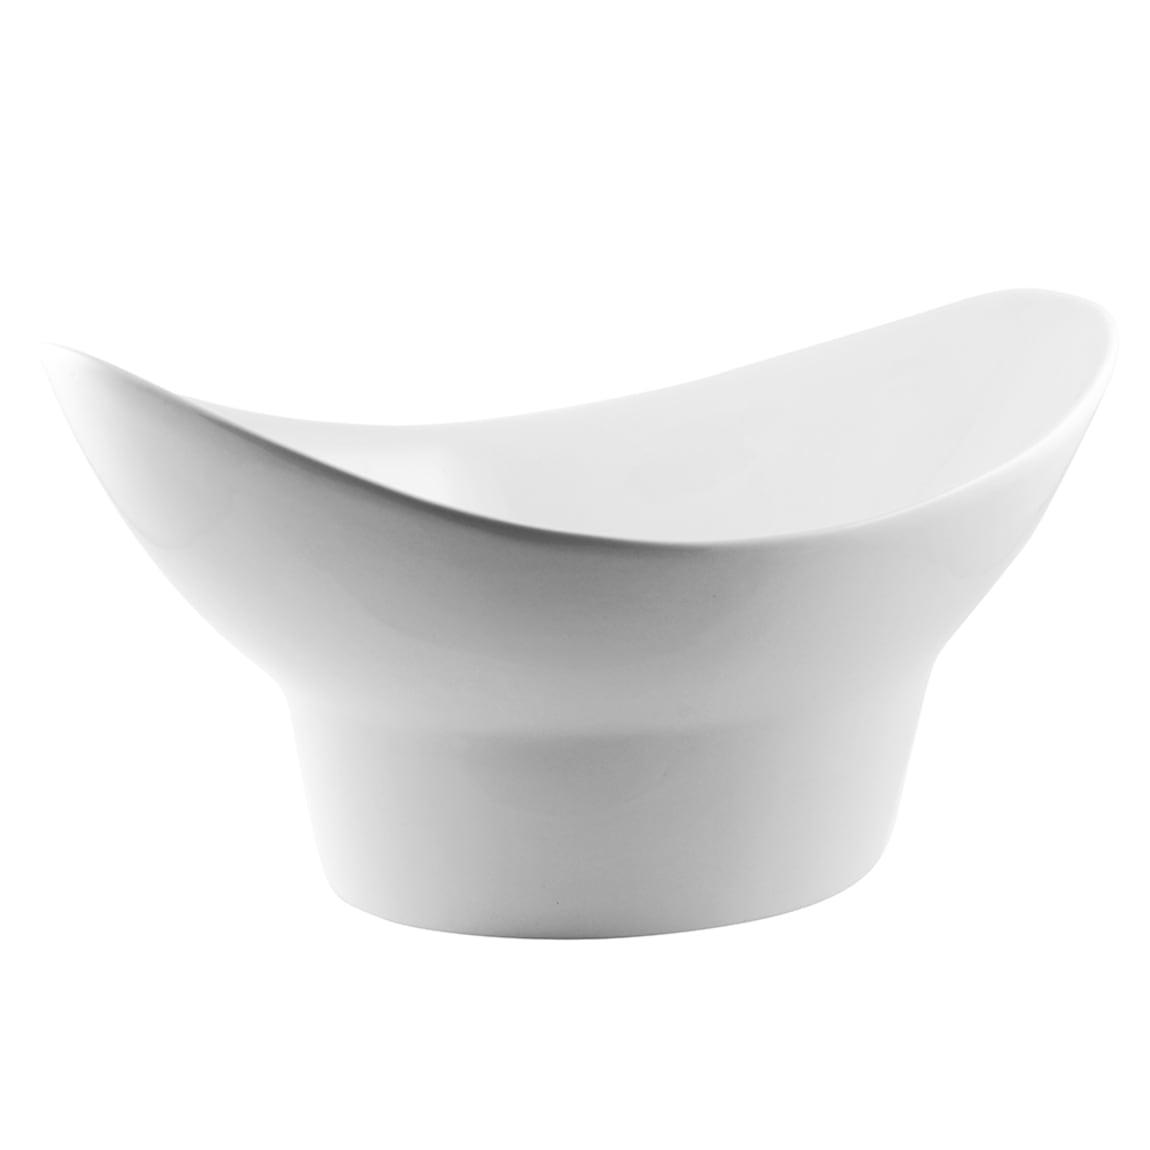 10 Strawberry Street WTR-11FTDOVLBWL 40 oz Oval Bowl - Porcelain, White